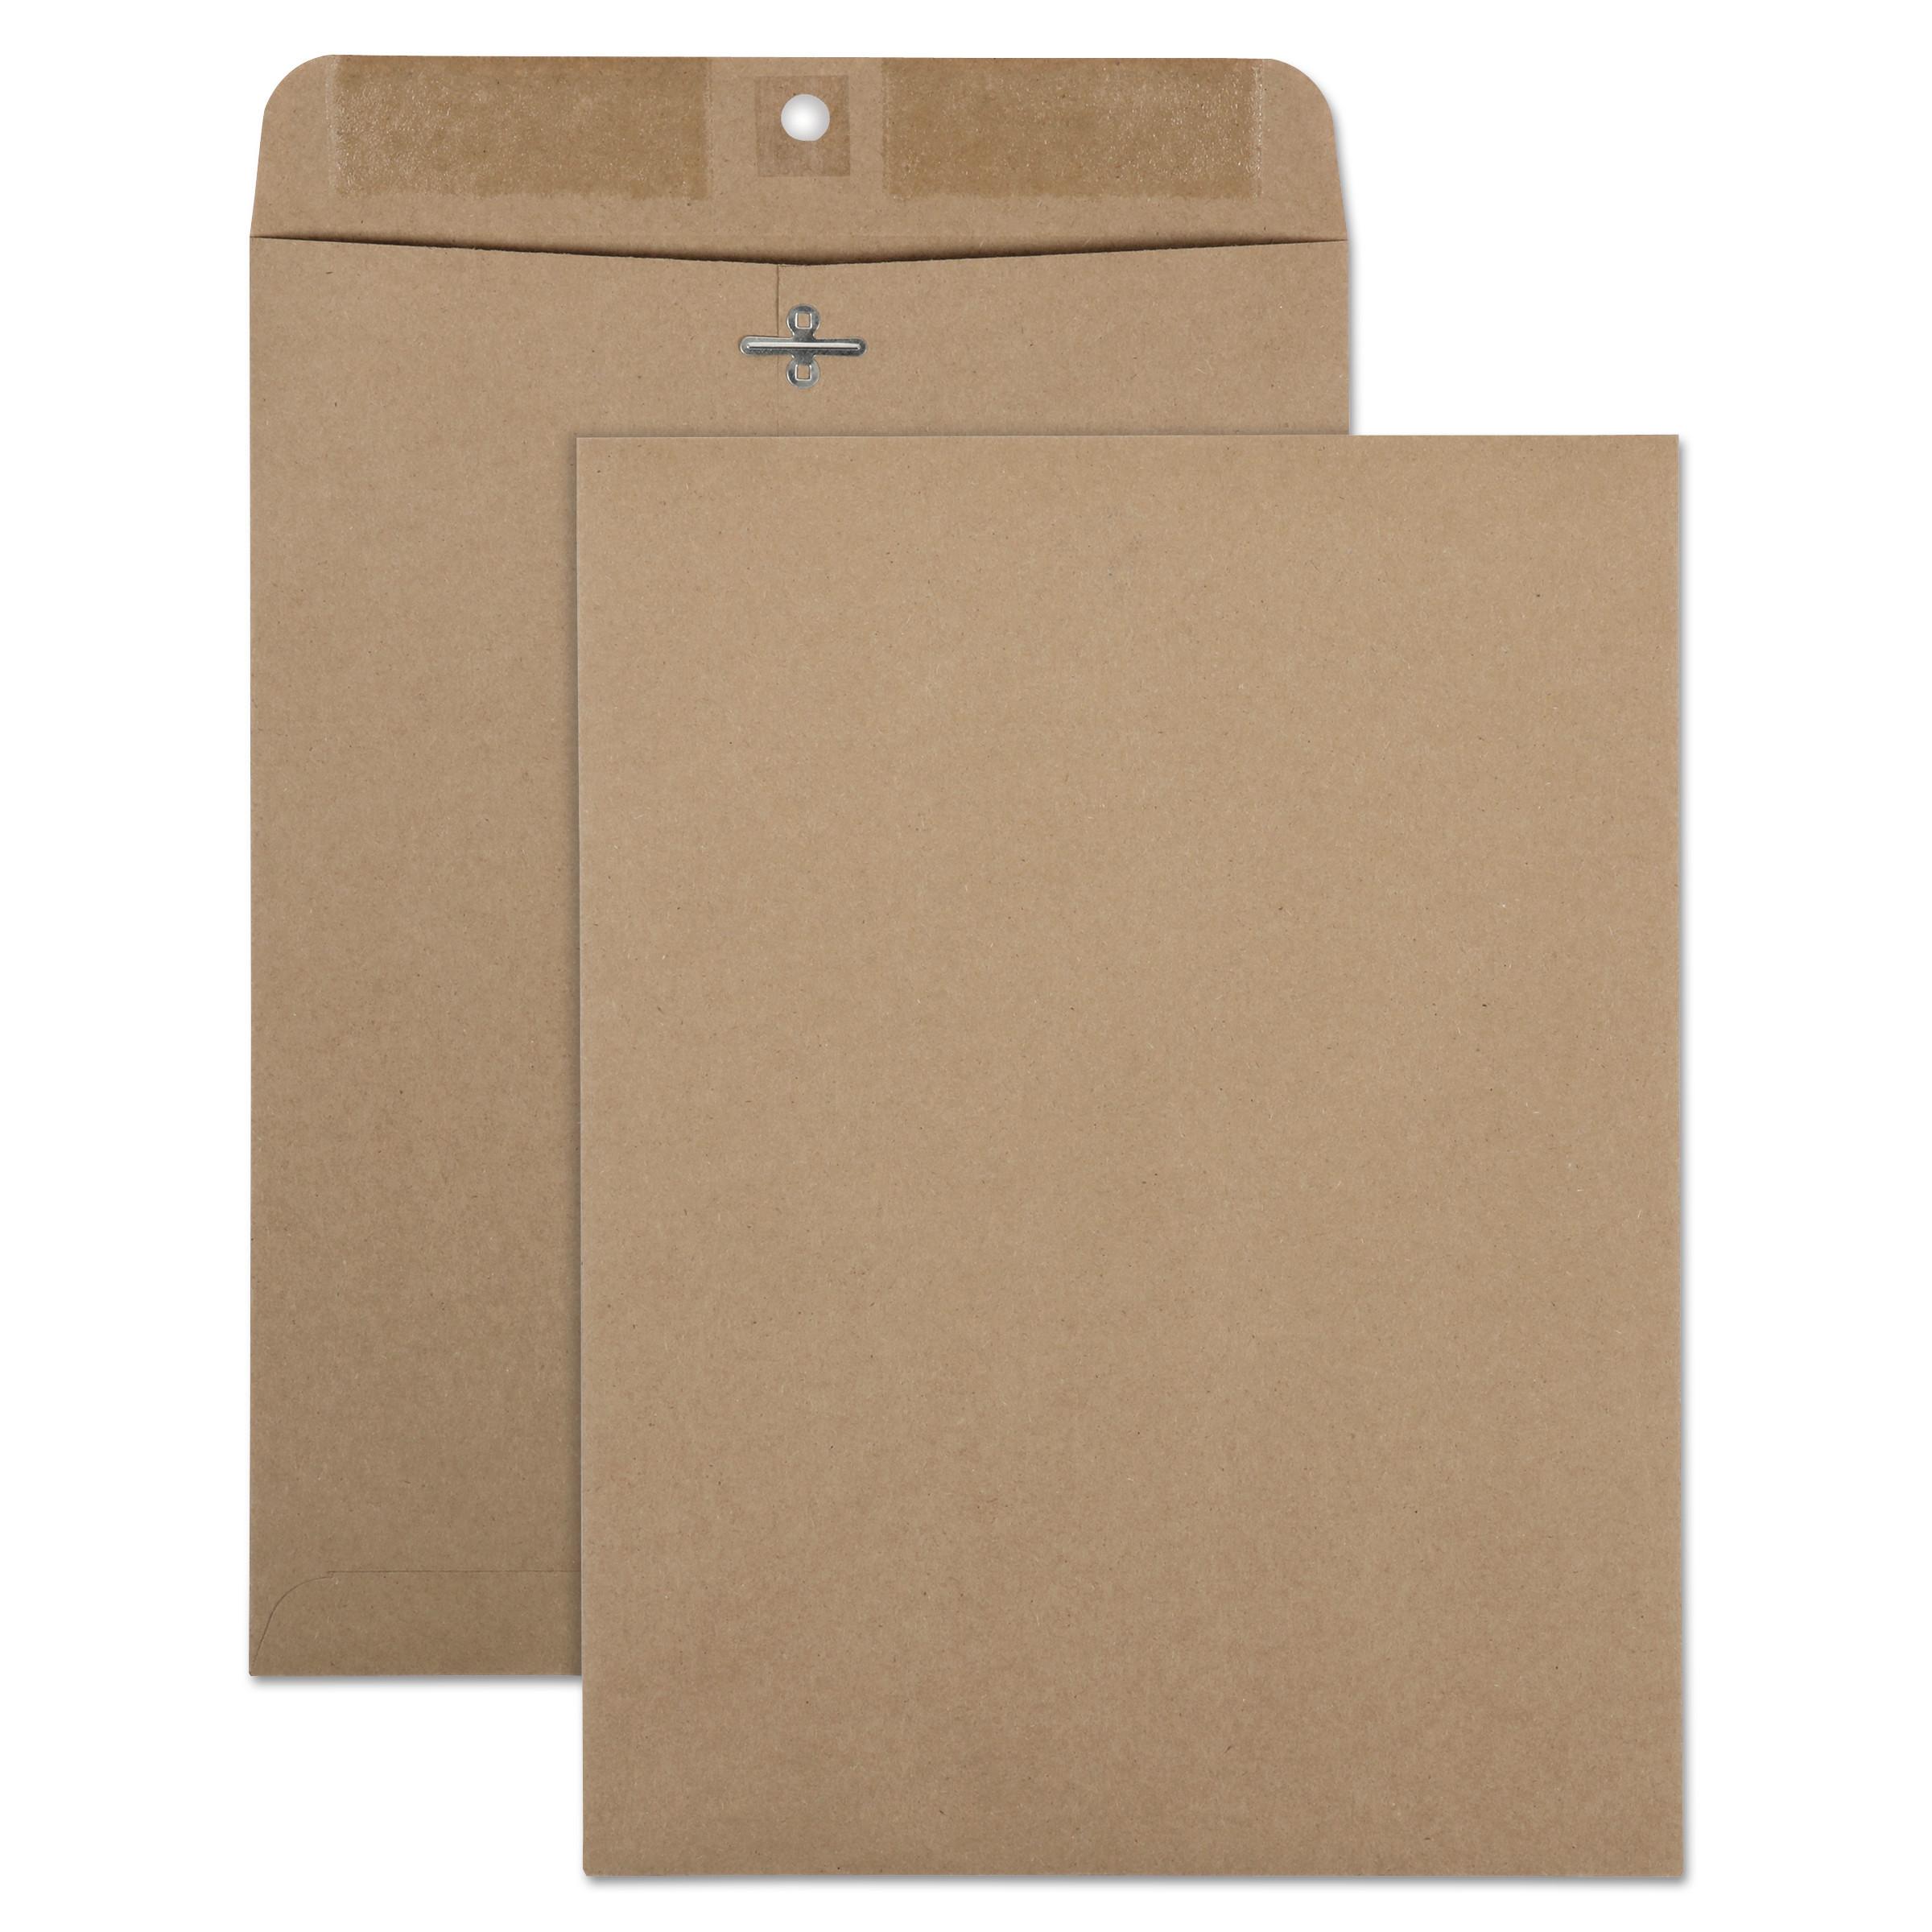 Quality Park 100% Recycled Brown Kraft Clasp Envelope, 9 x 12, Brown Kraft, 100/Box -QUA38711